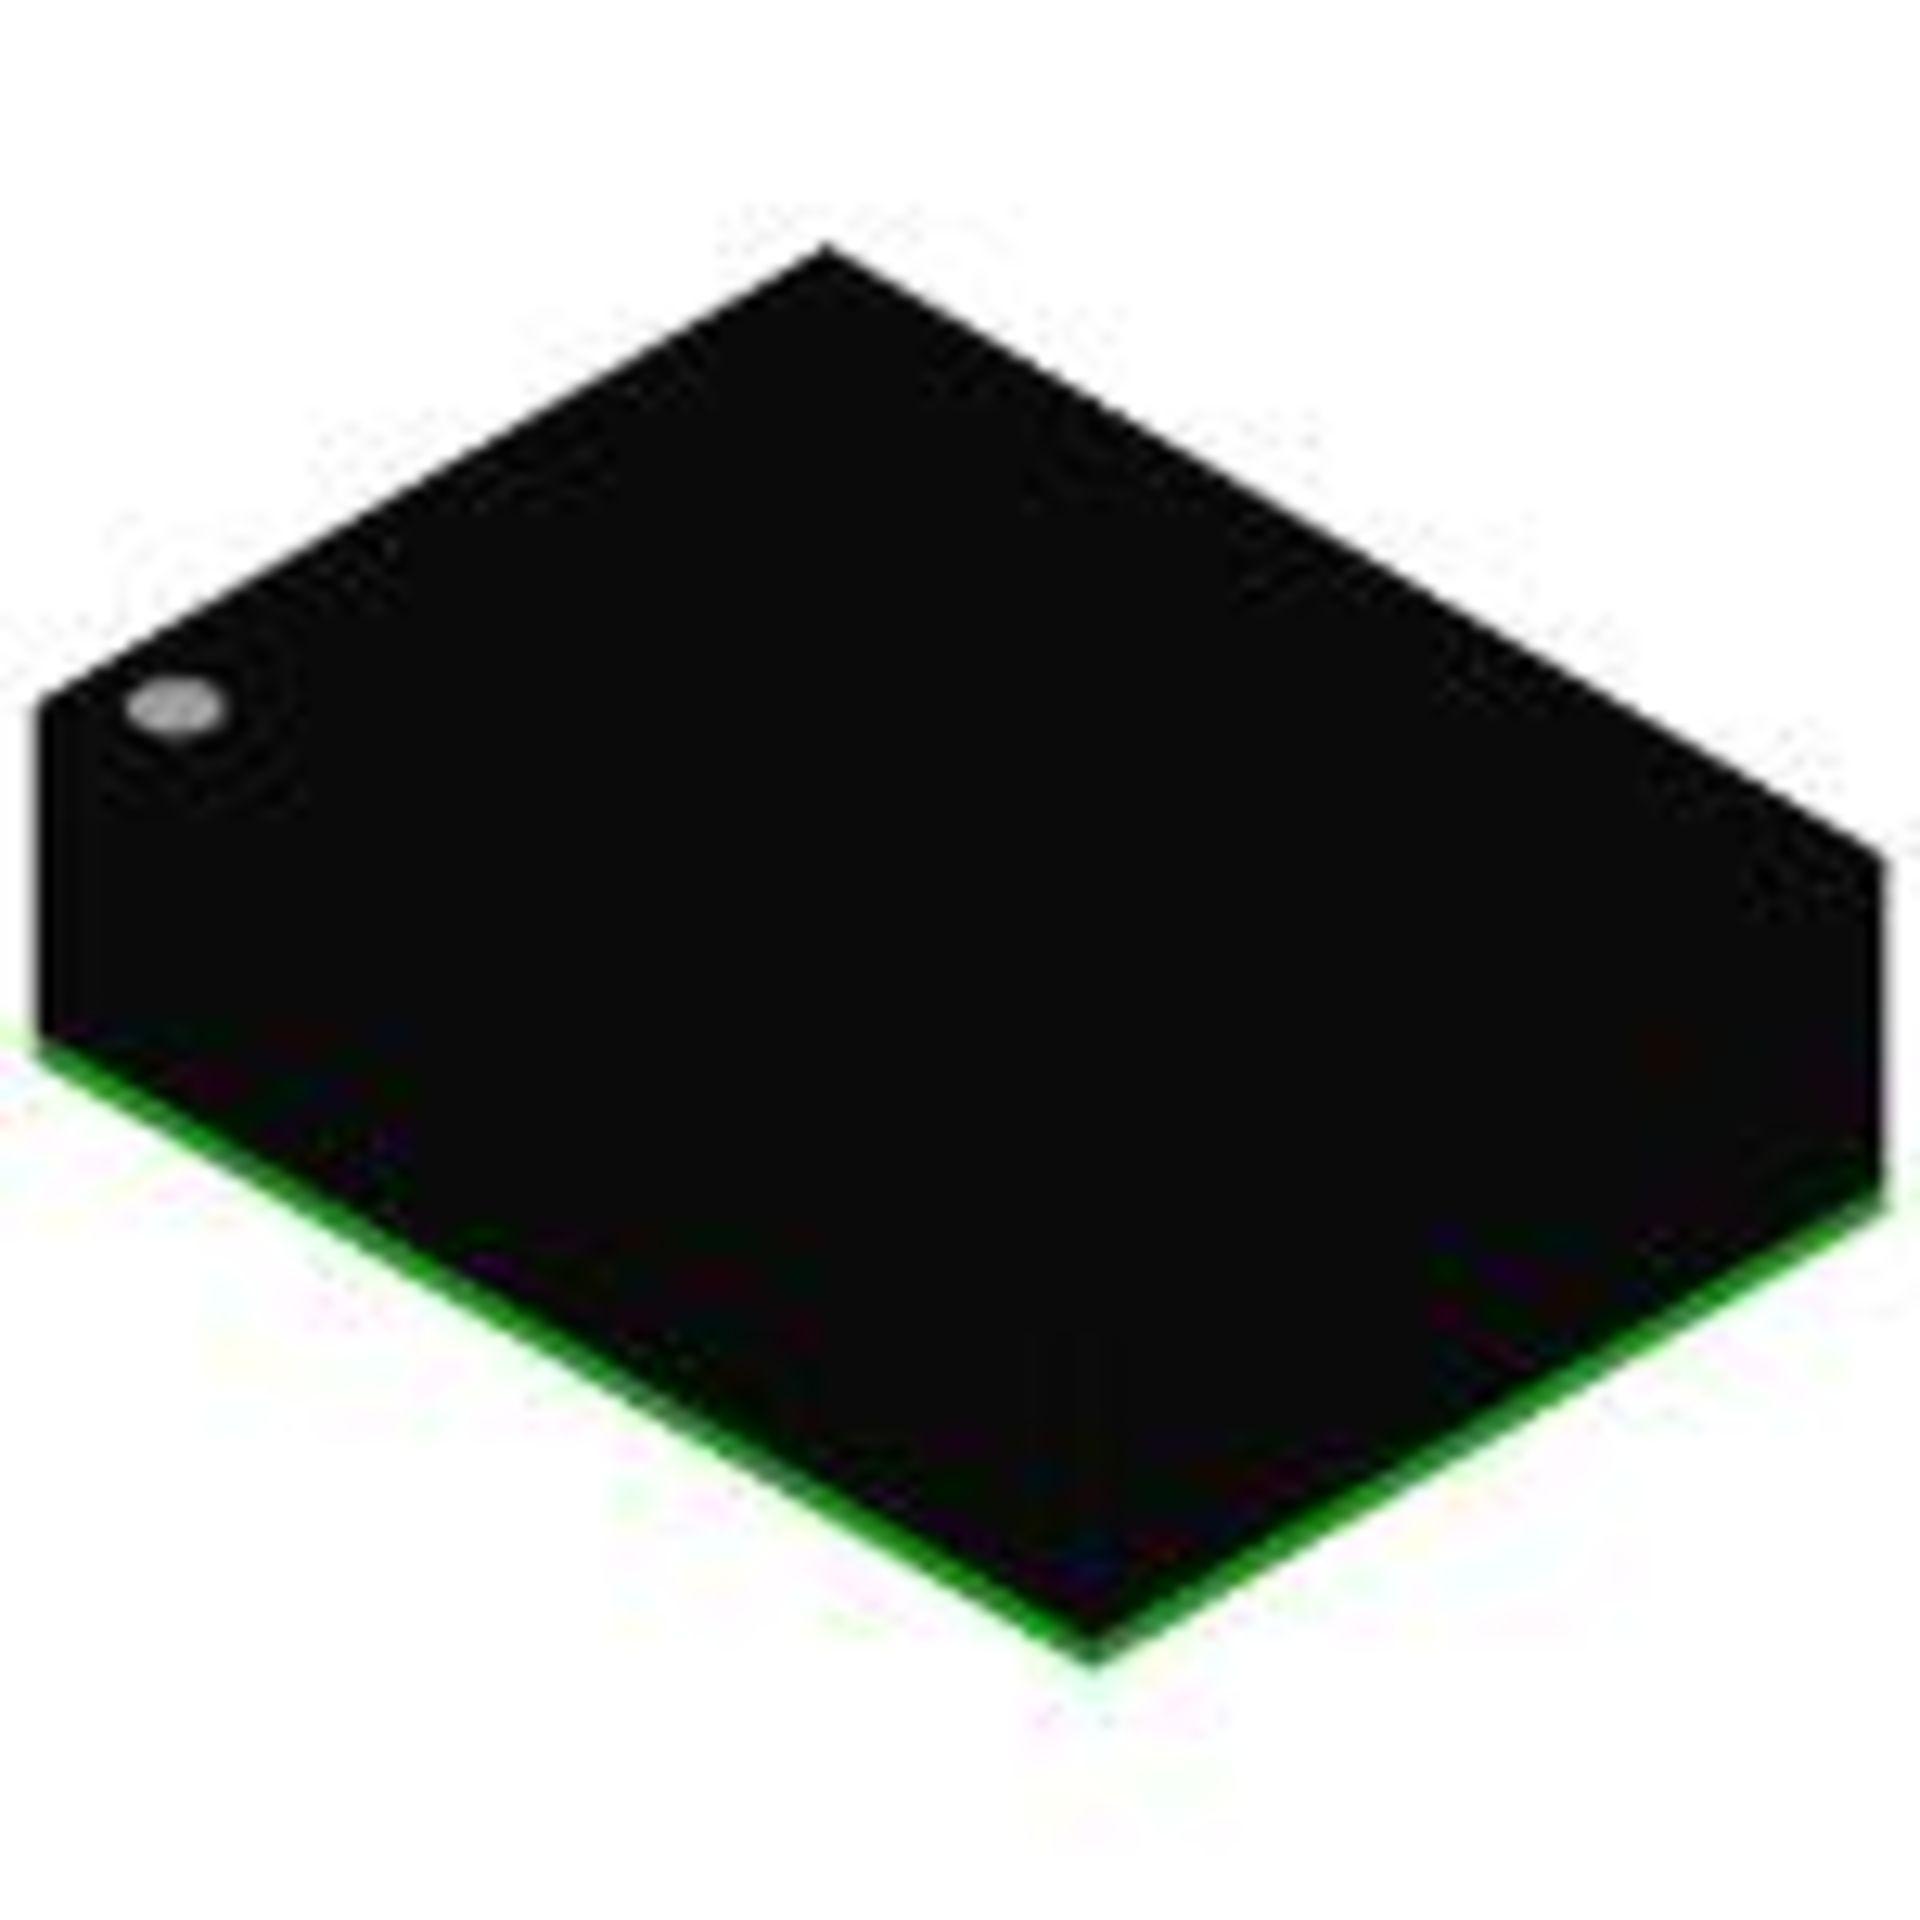 LTM8033EV#PBF Automotive DC to DC Converter and Switching Regulator Module, Ultralow Noise EMC